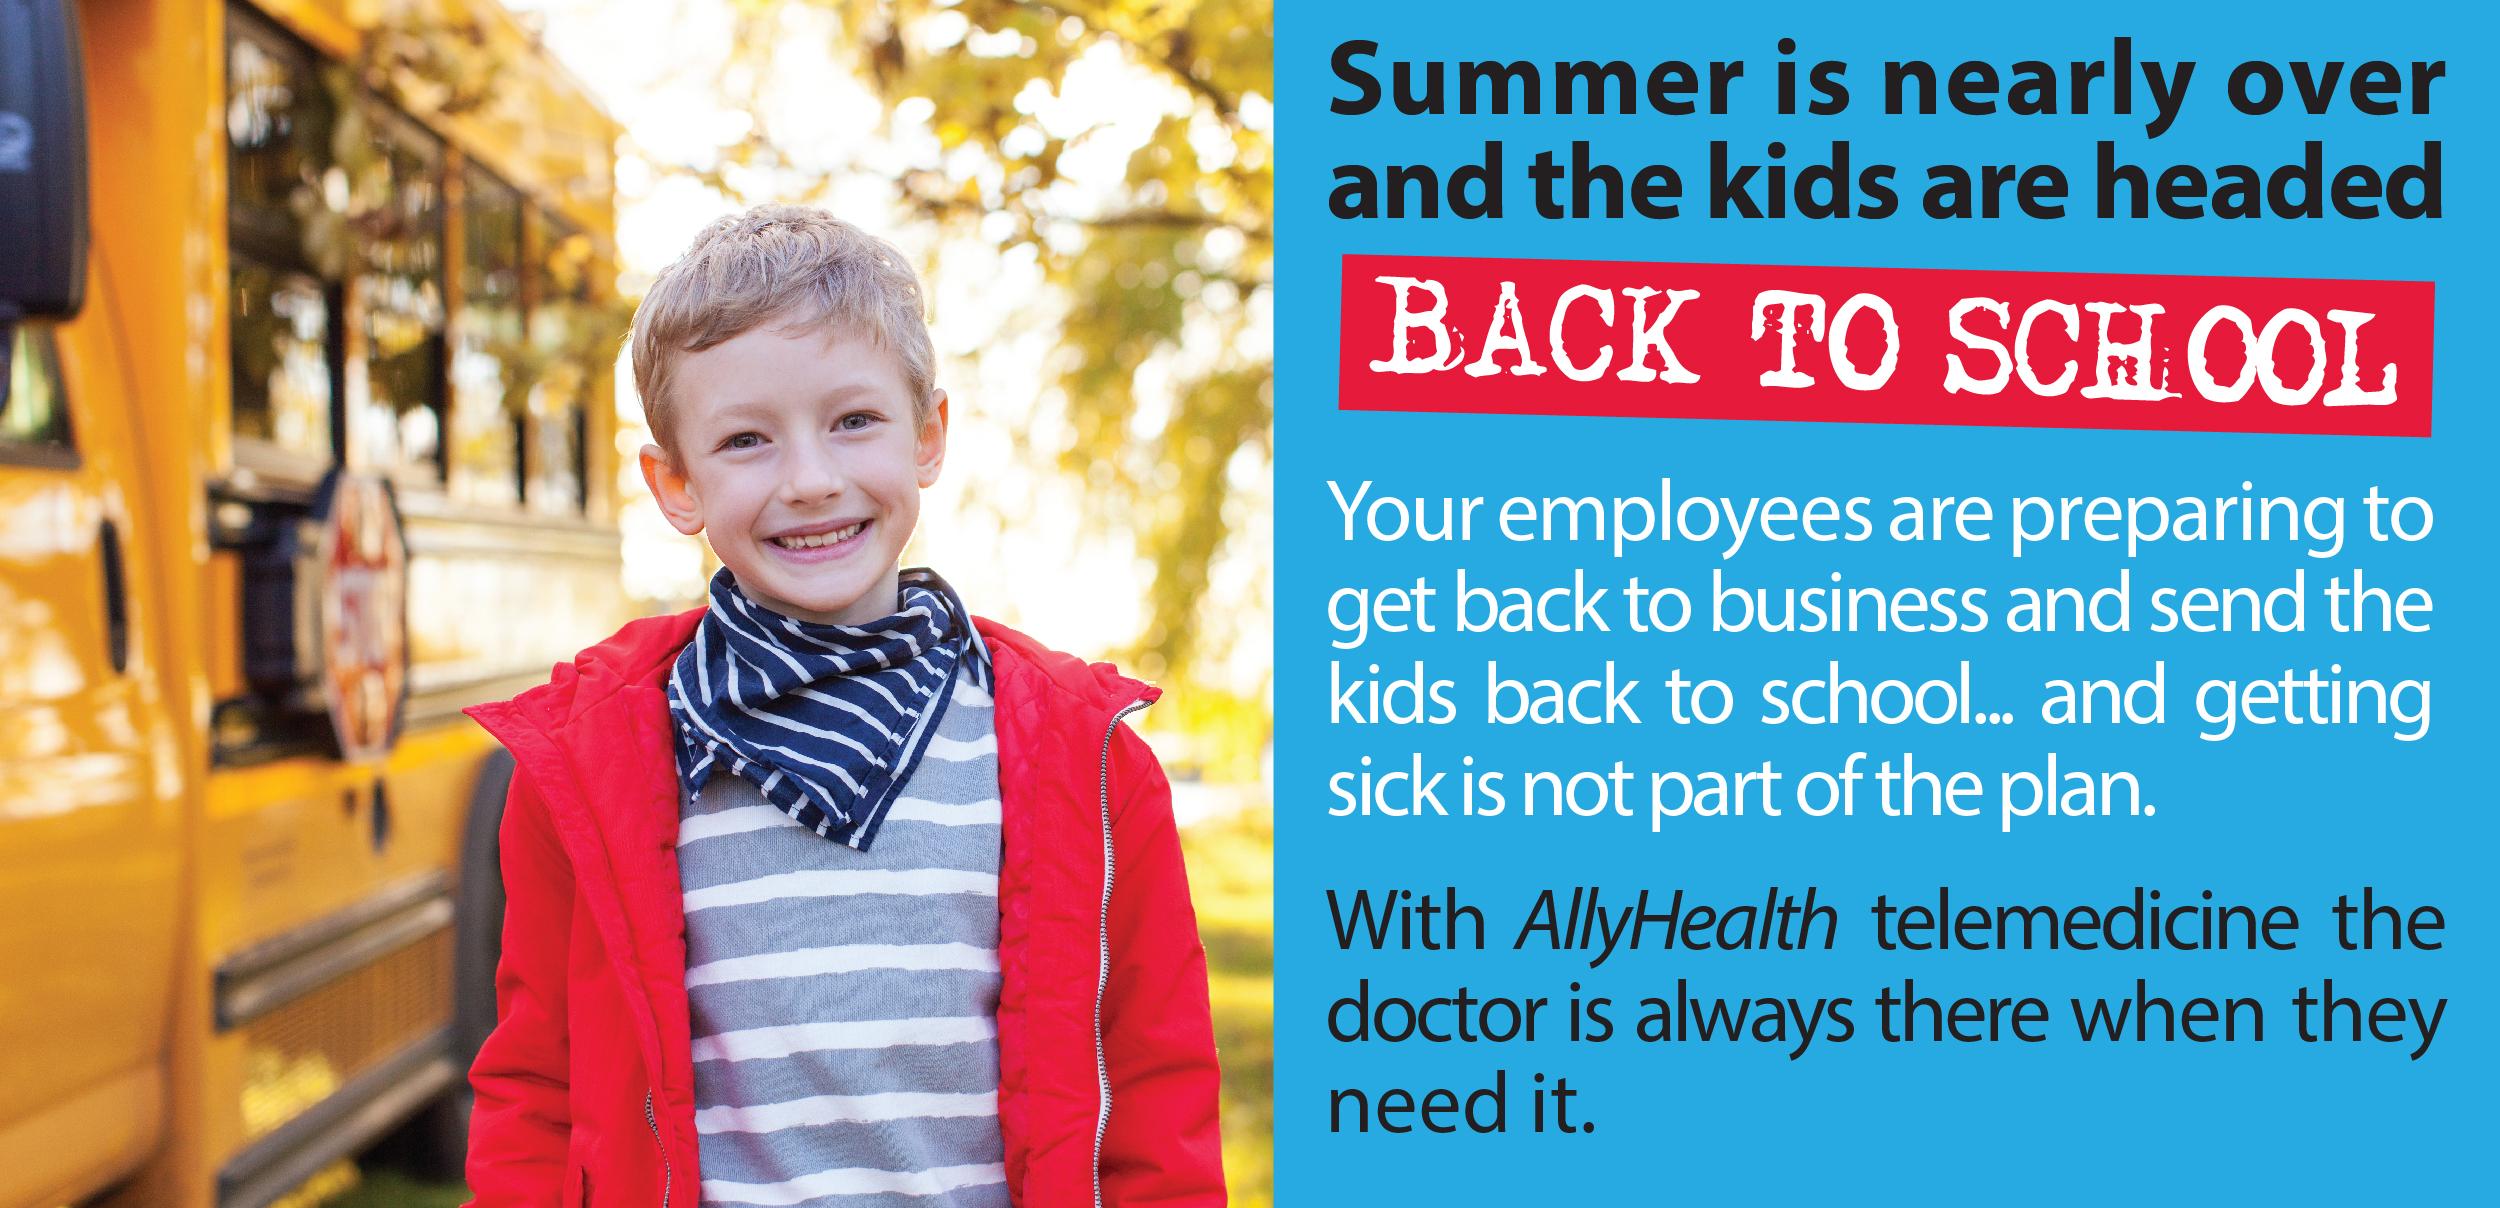 AllyHealth back to school image